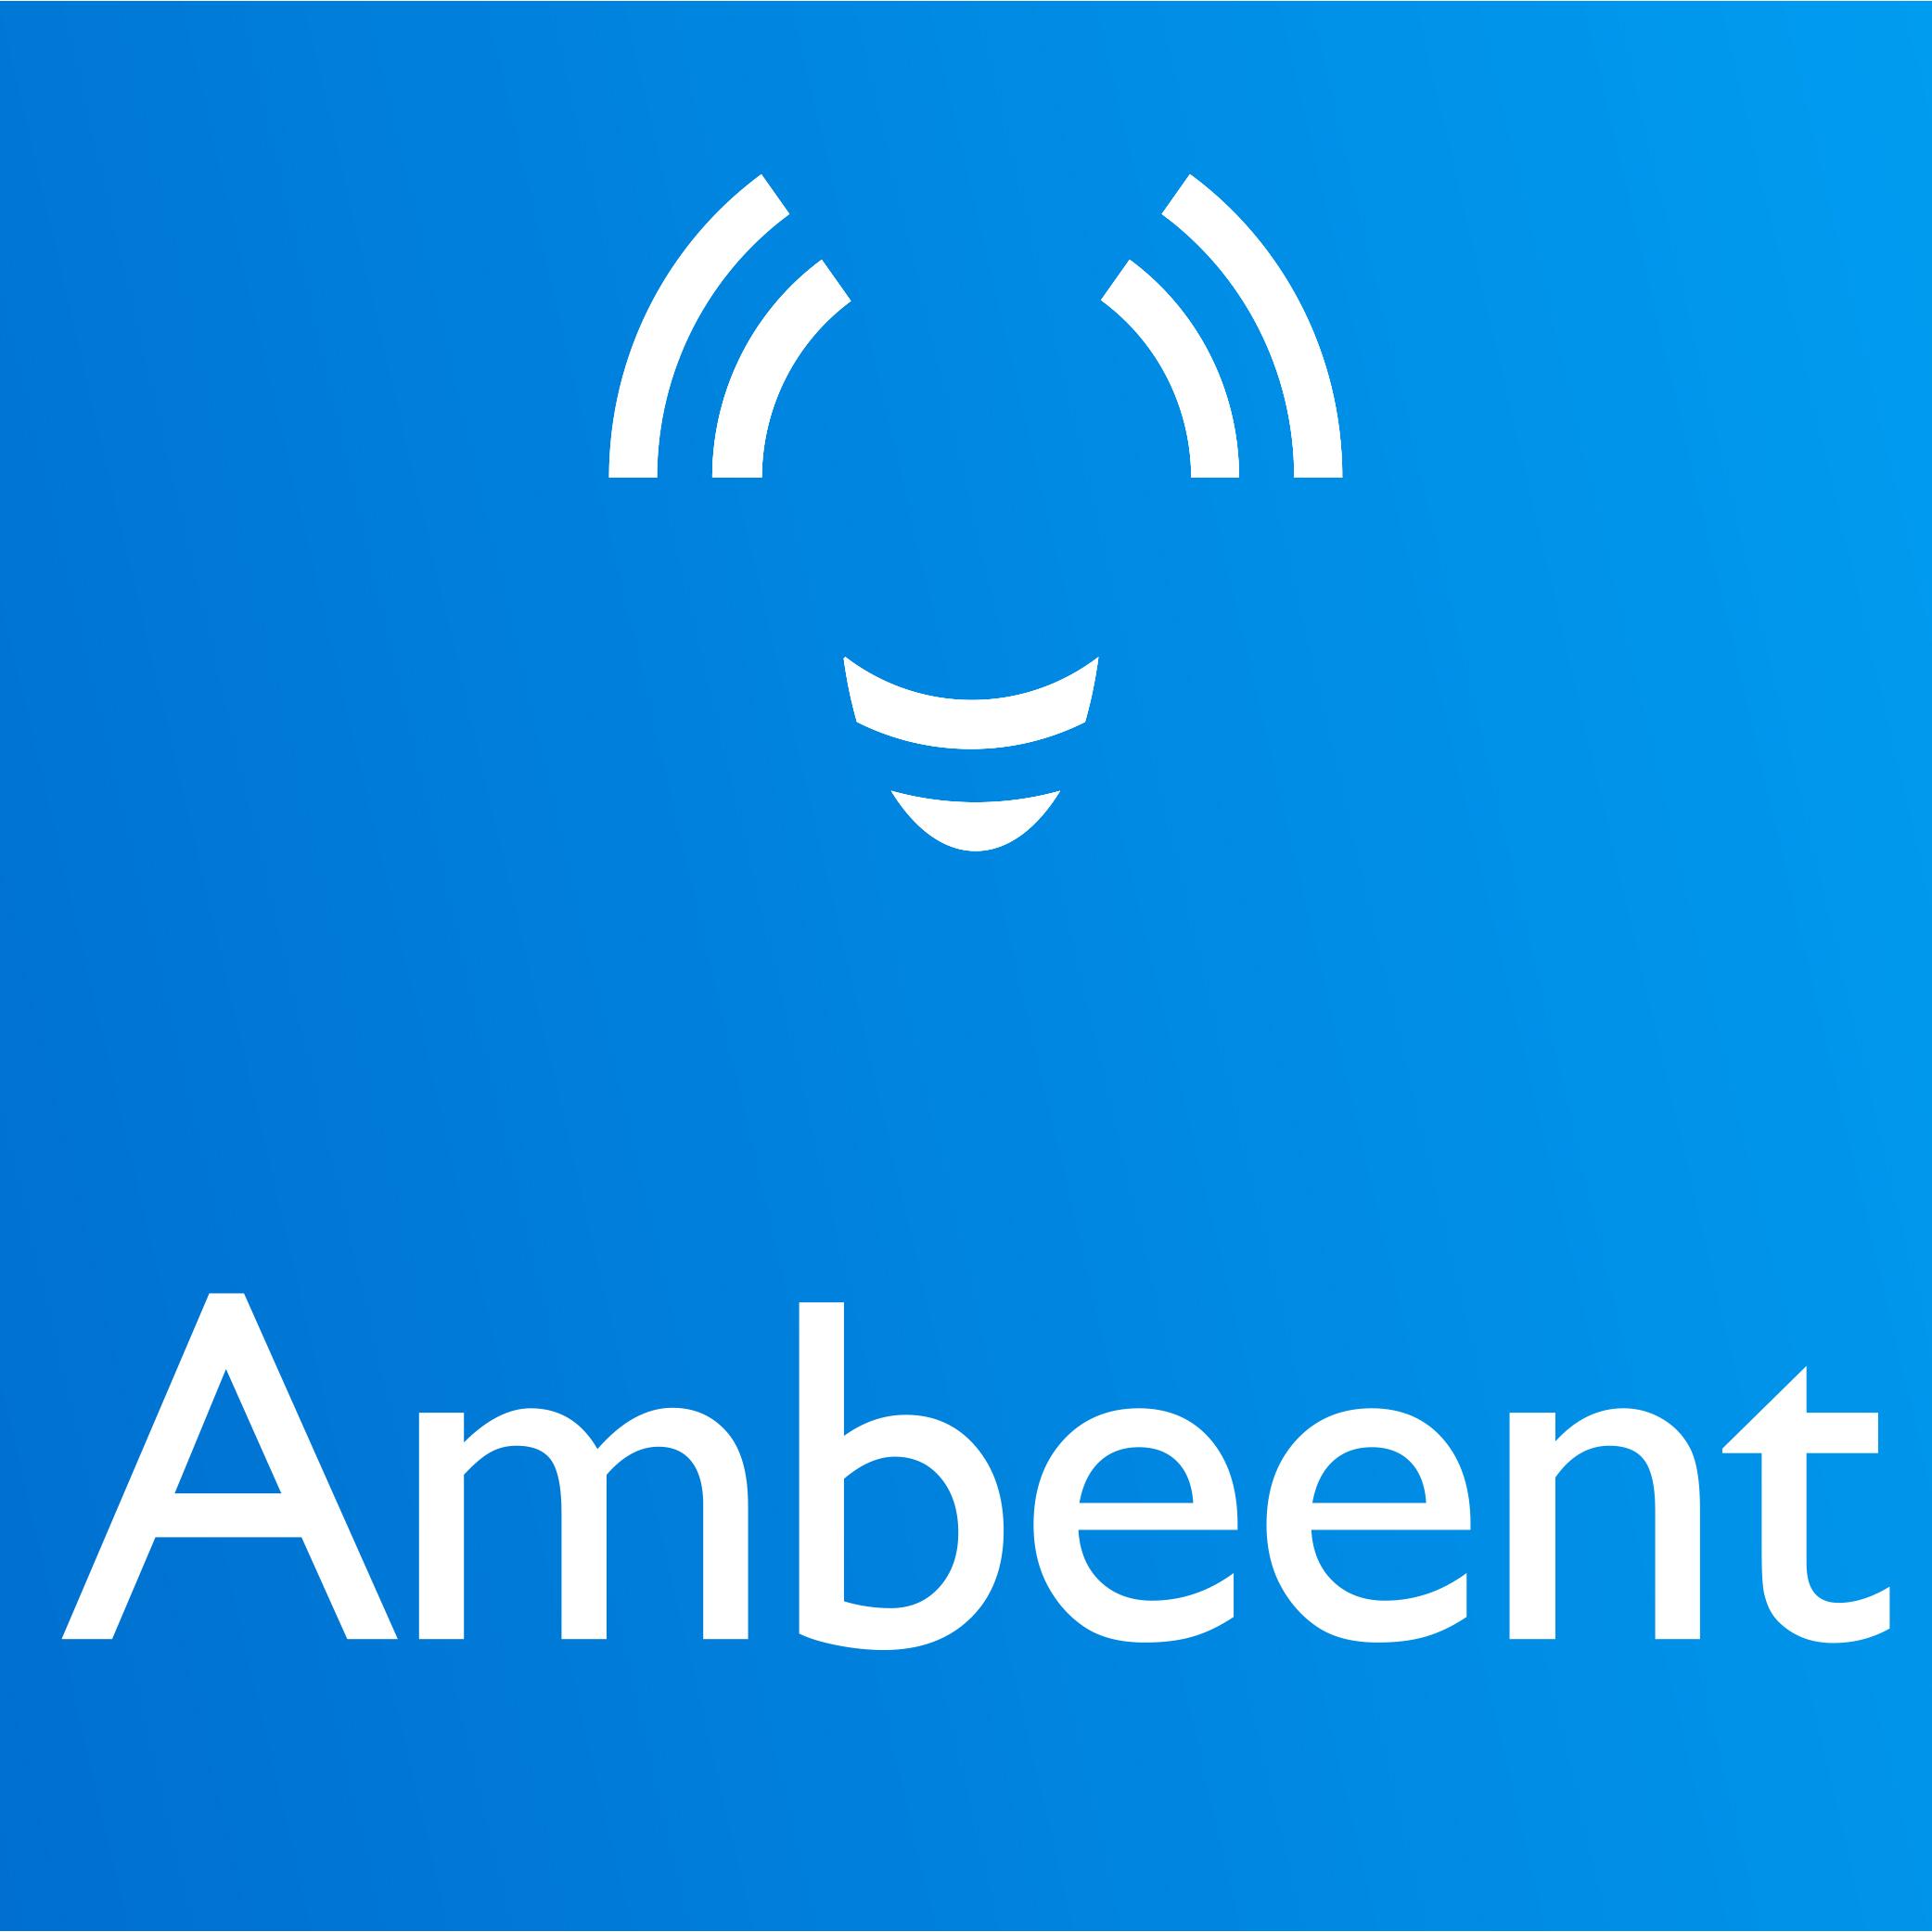 Ambeent